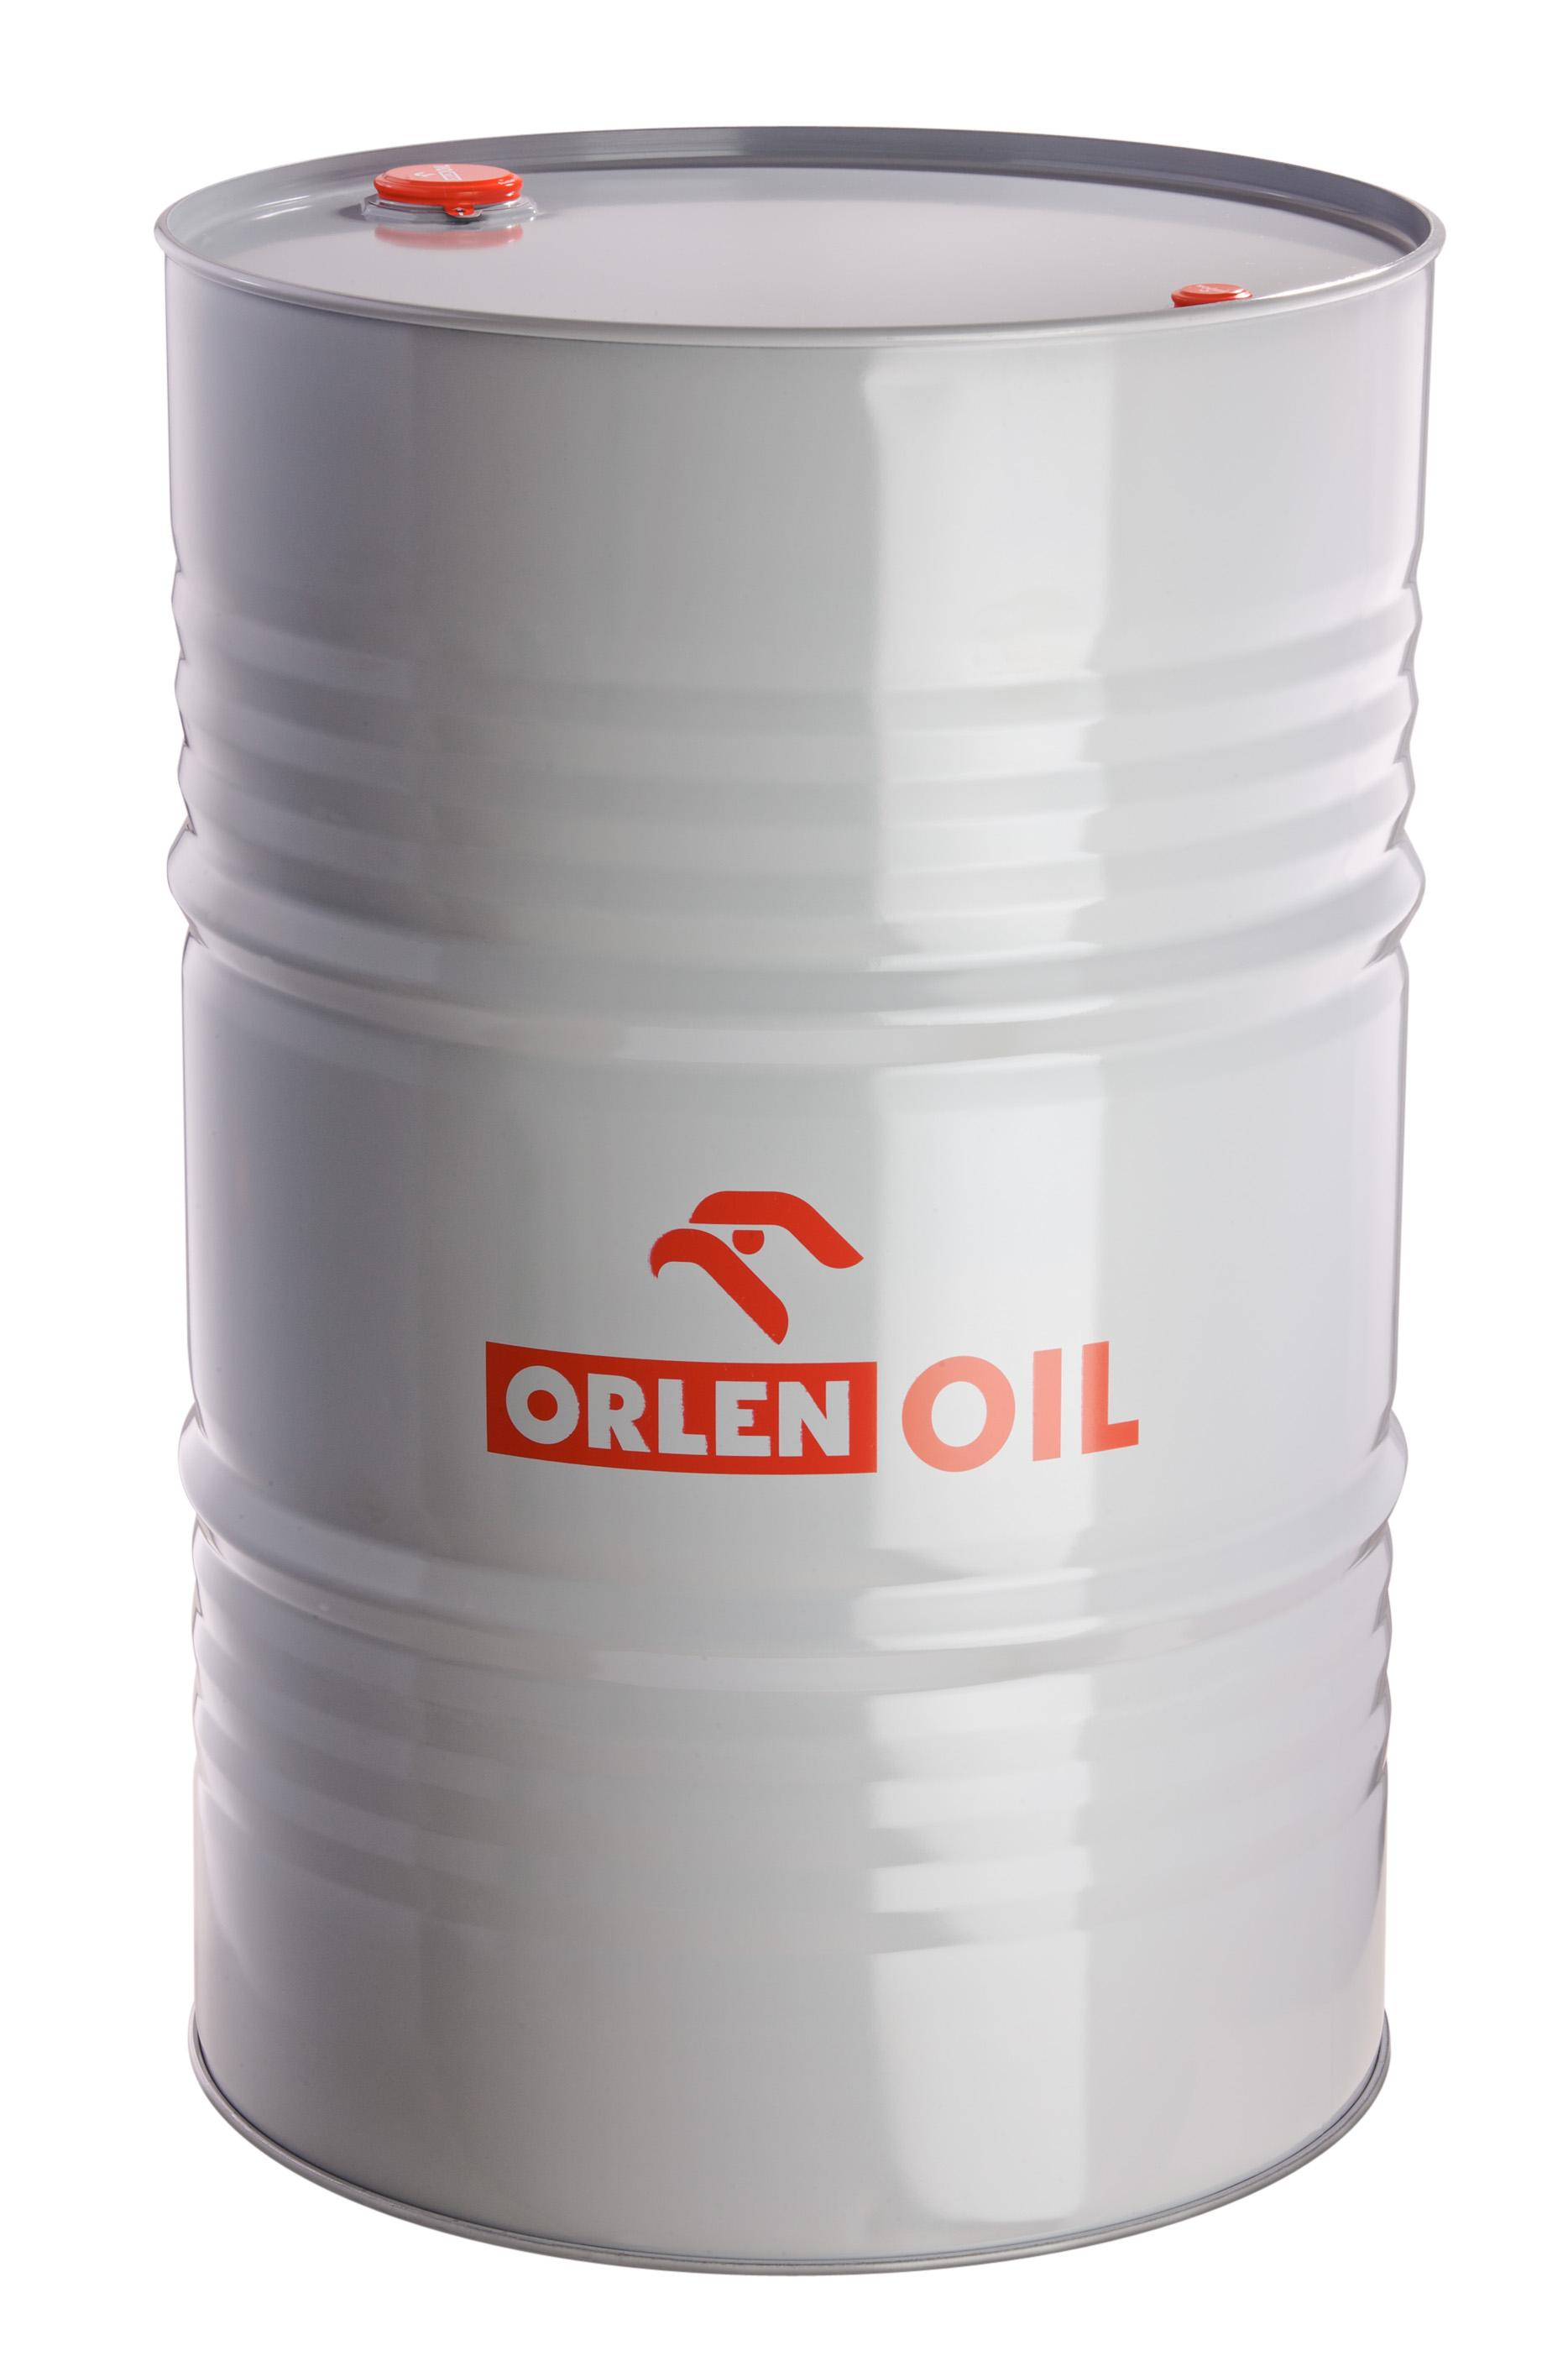 ORLEN OIL TRANSGEAR PE 320   BECZKA 205L**